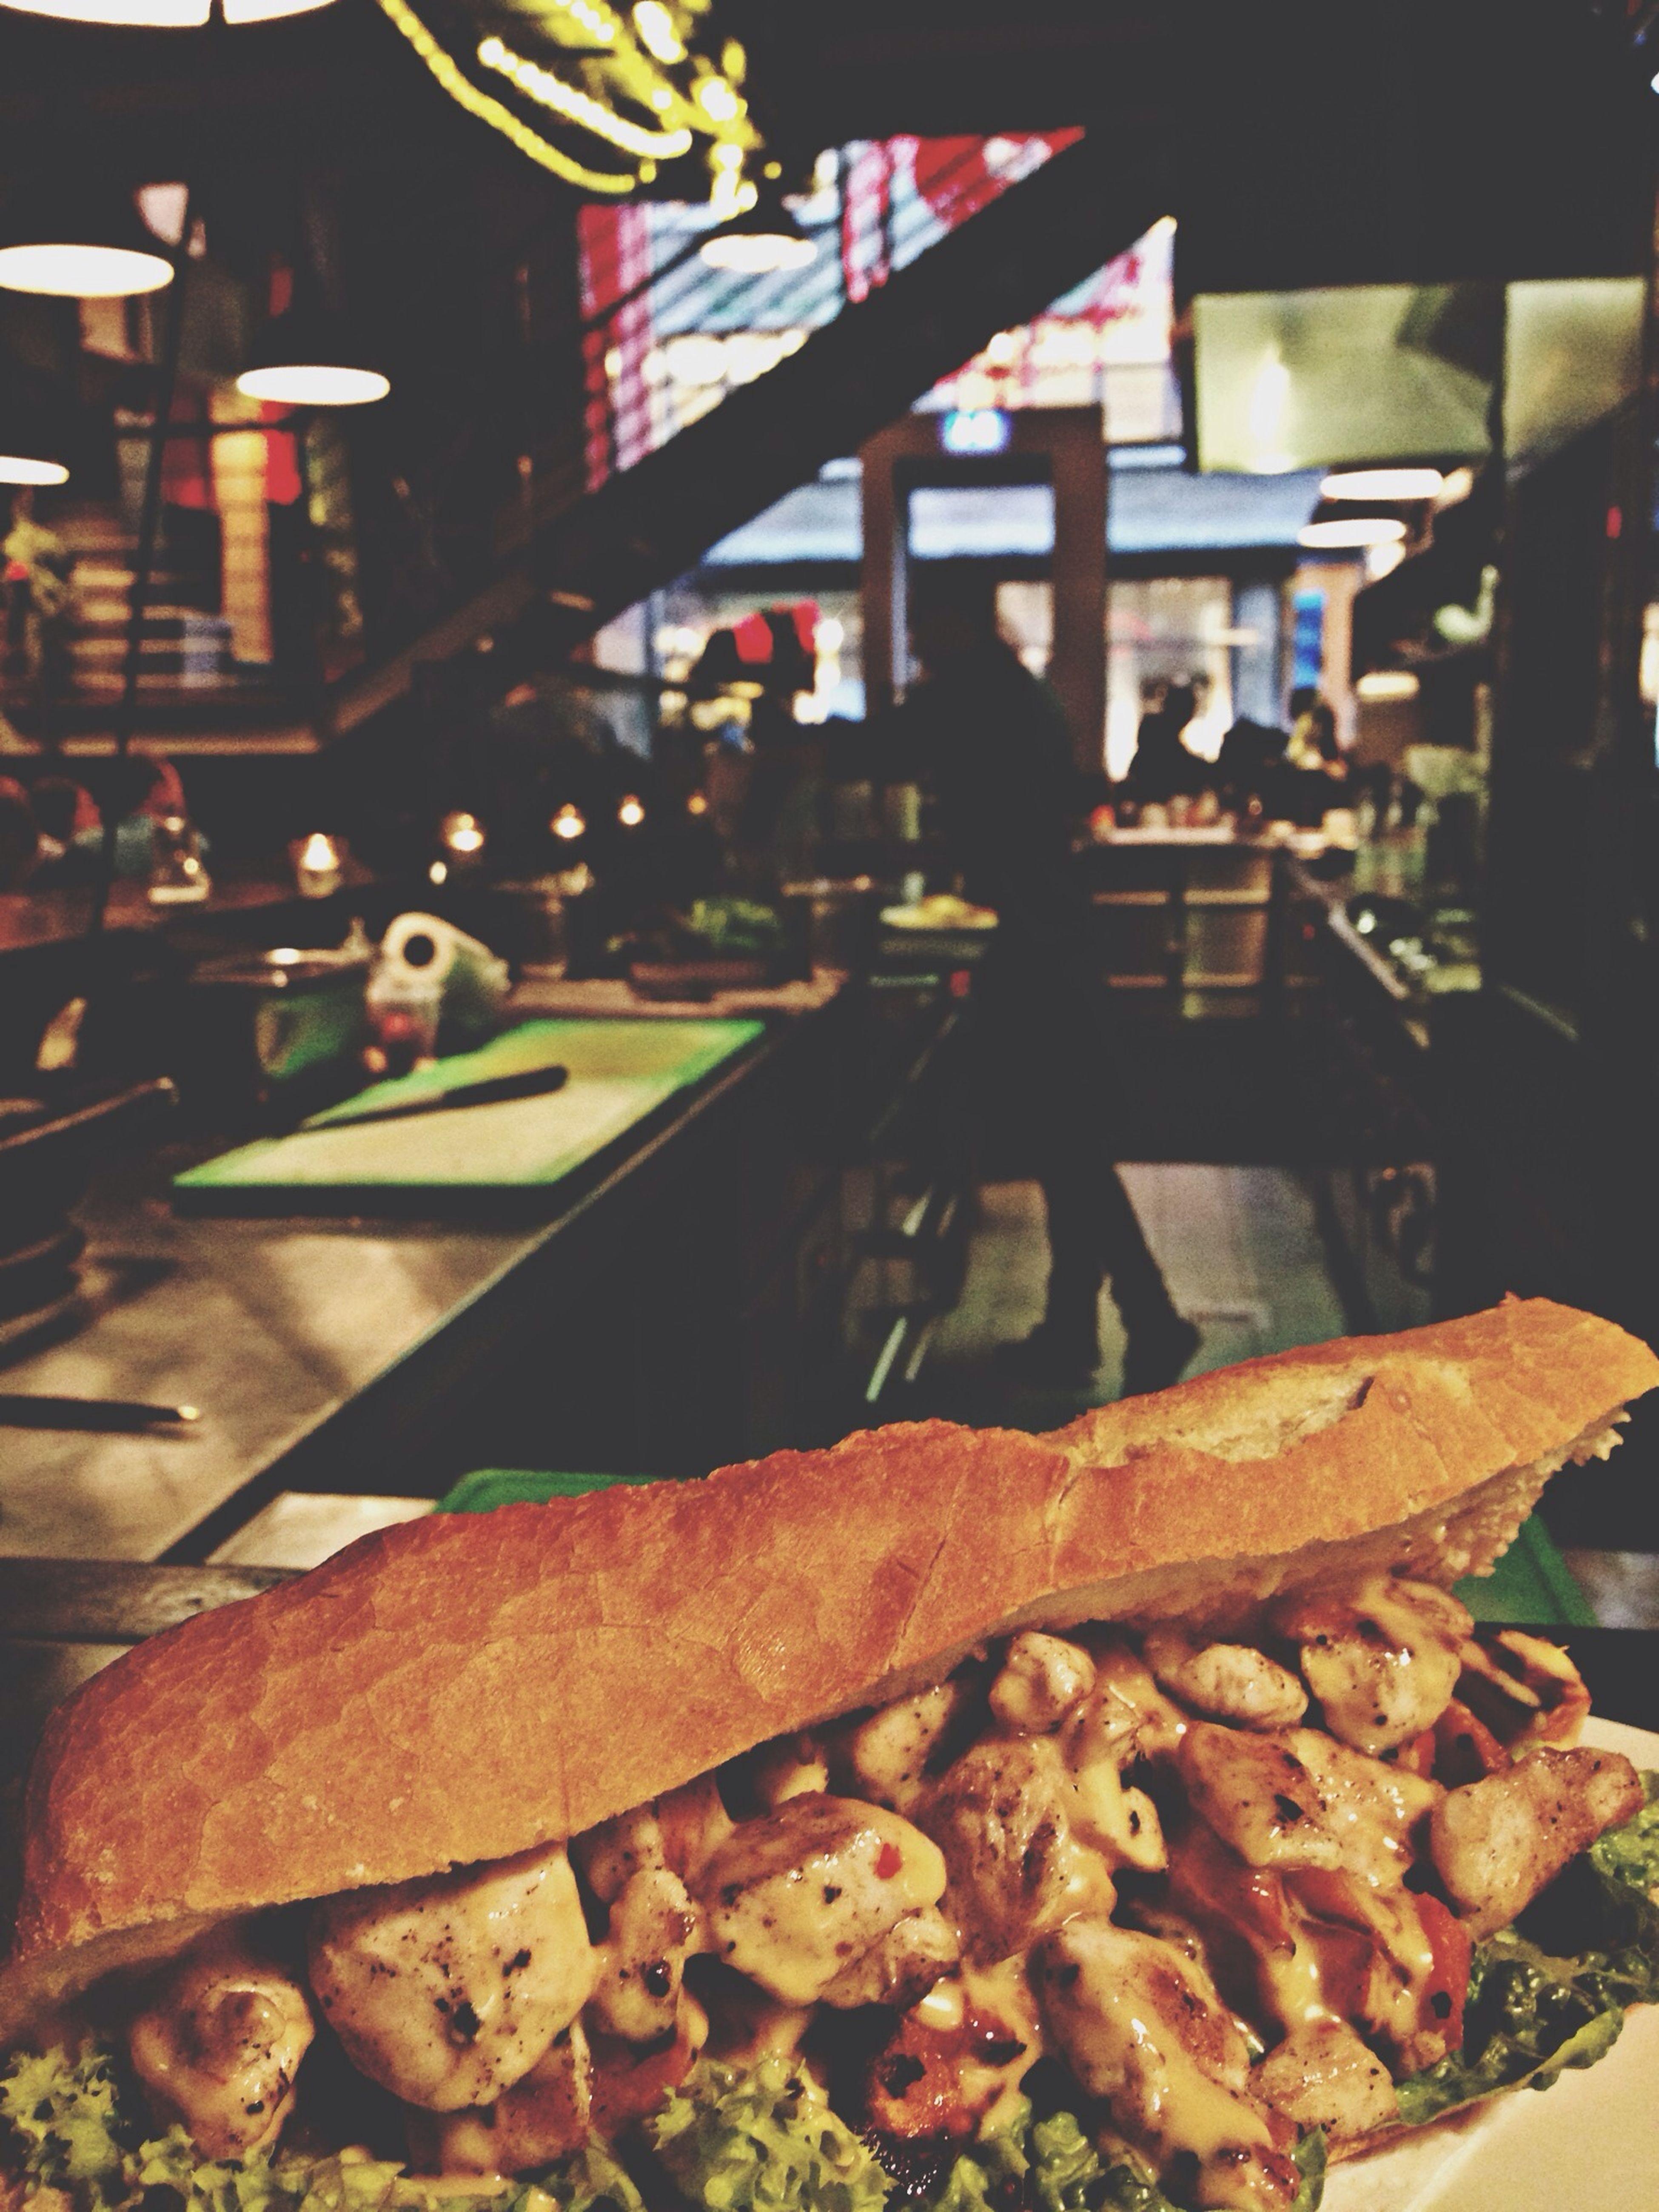 come in and ask for Sinbad, get a free hug. LuigiZuckermann Cafe Berlin Wittenbergplatz Food